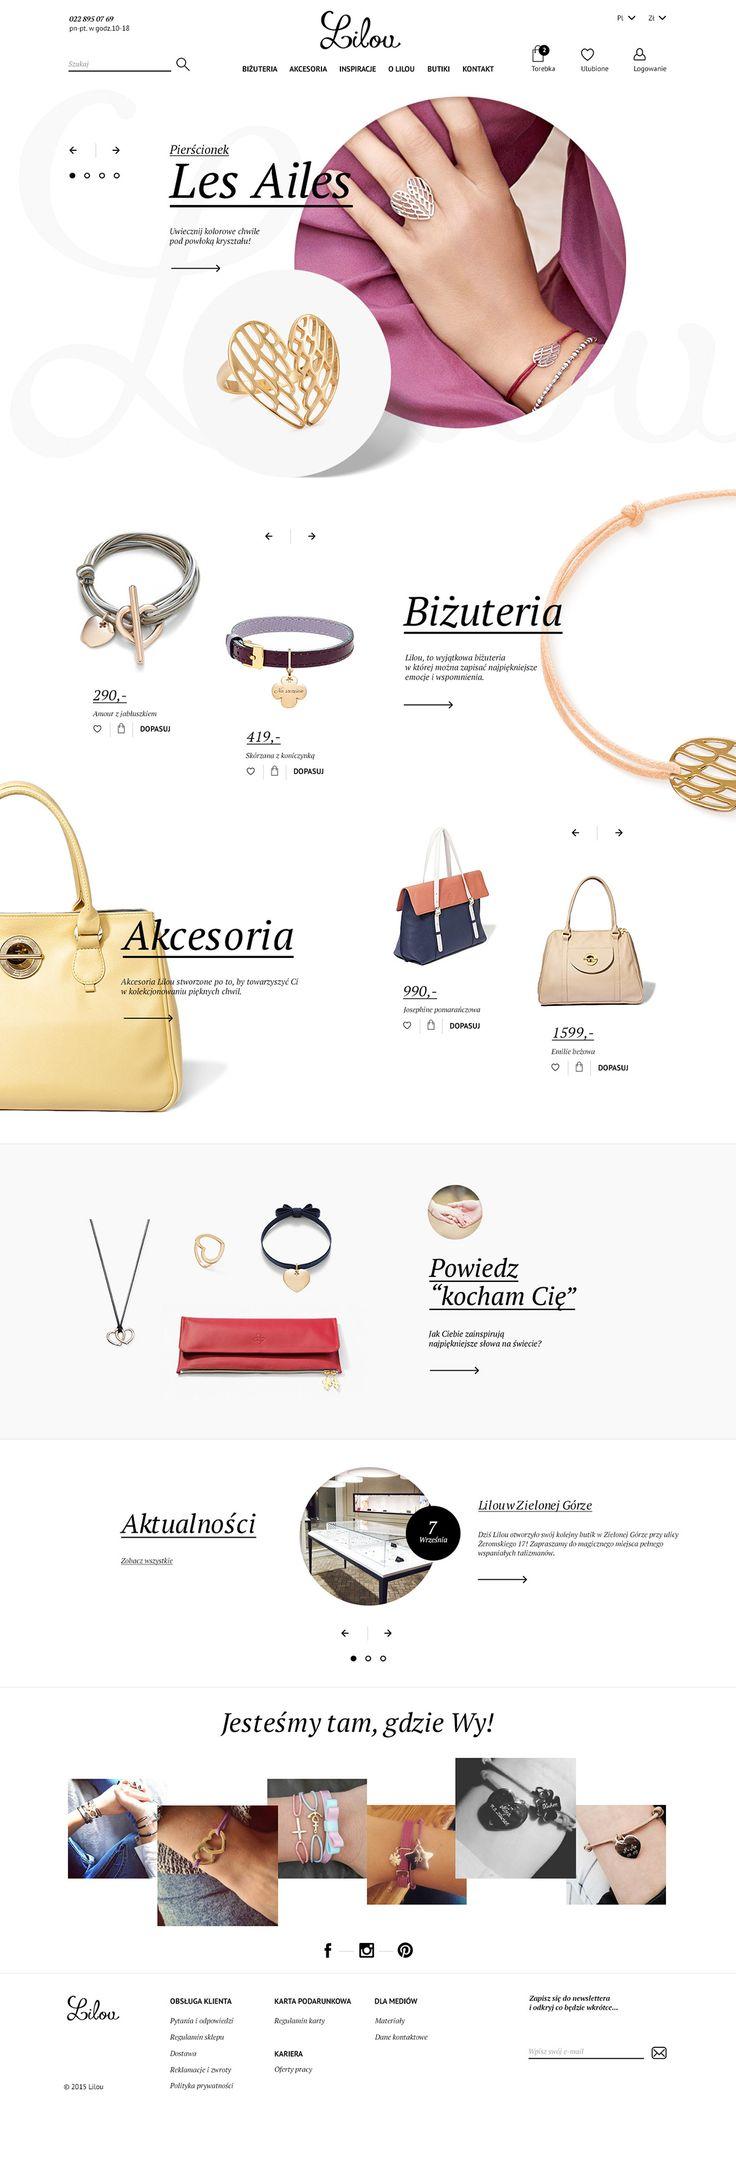 Website project for polish jewelry company - Lilou.